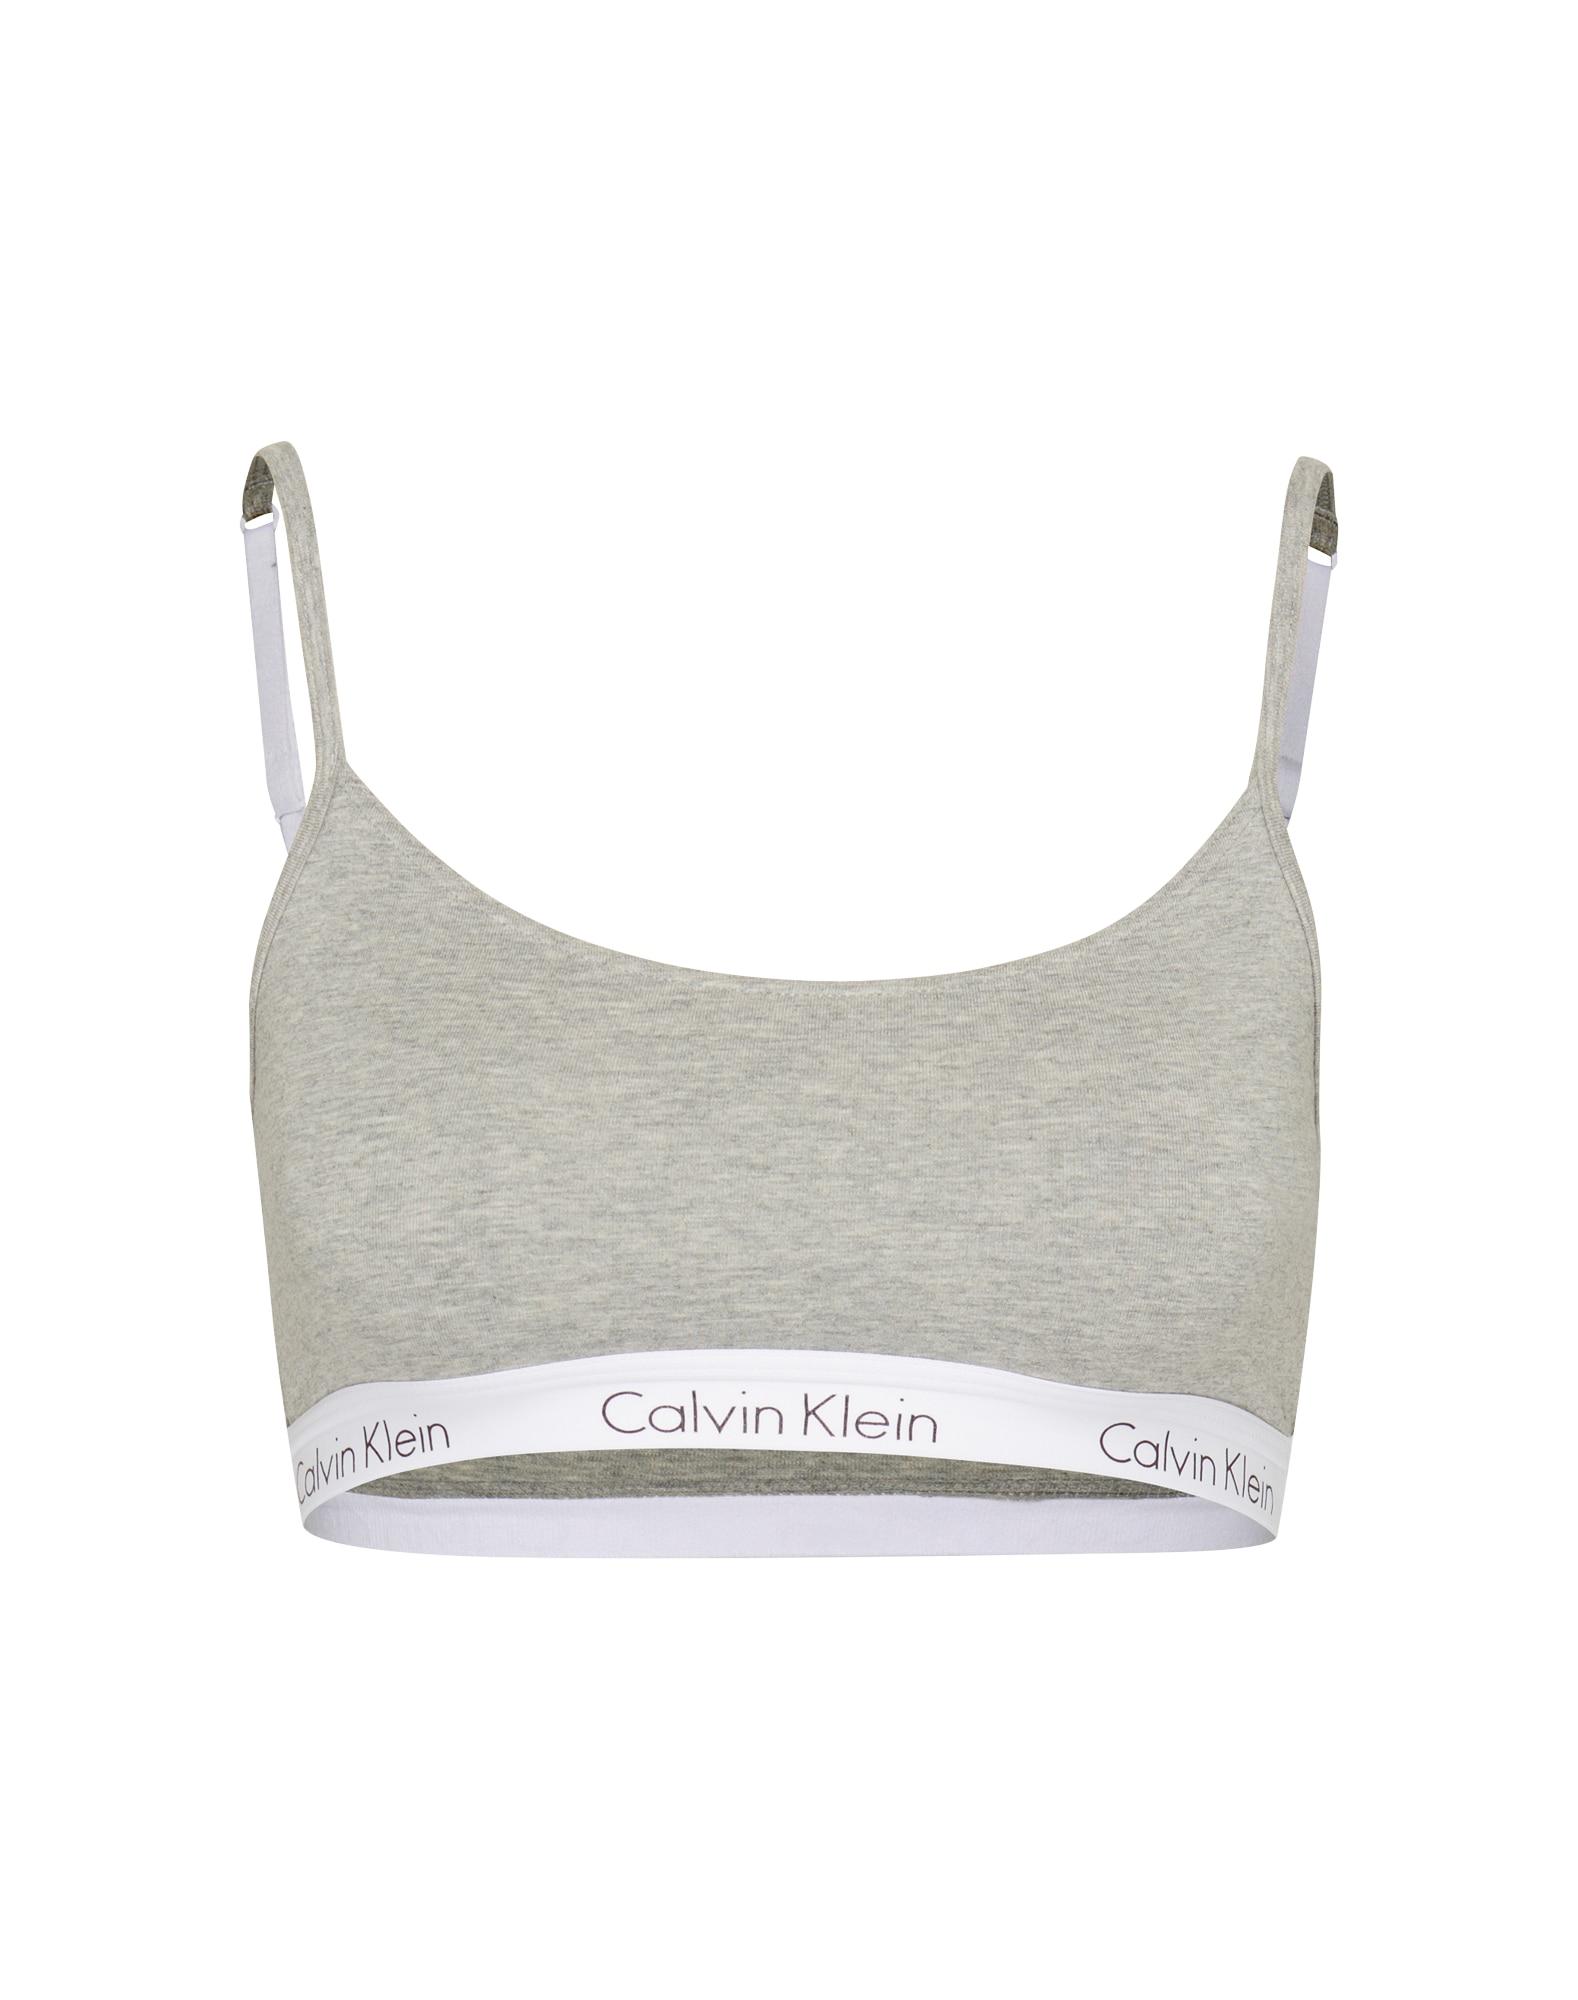 Calvin Klein Underwear Liemenėlė 'BRALETTE' šviesiai pilka